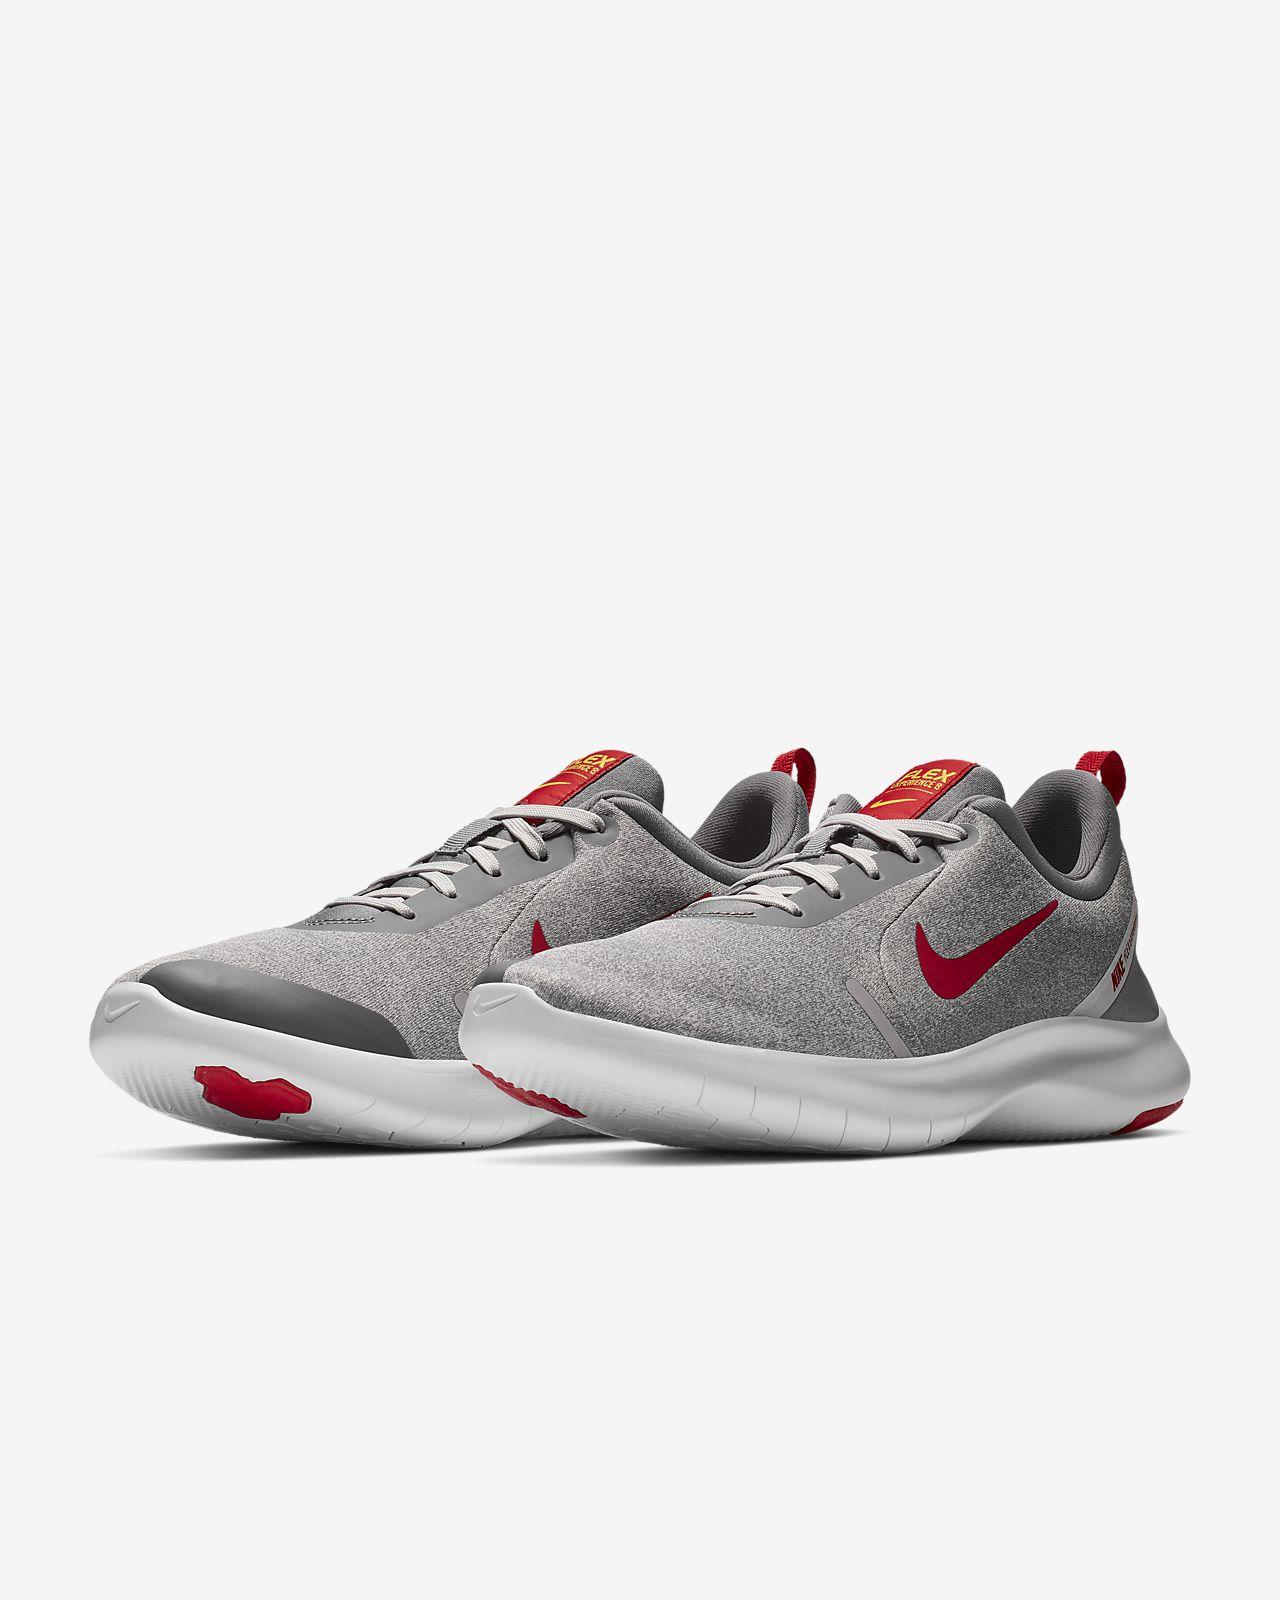 4e62df34dbf8 Nike Flex Experience RN 8 Men s Running Shoe. Nike.com ZA